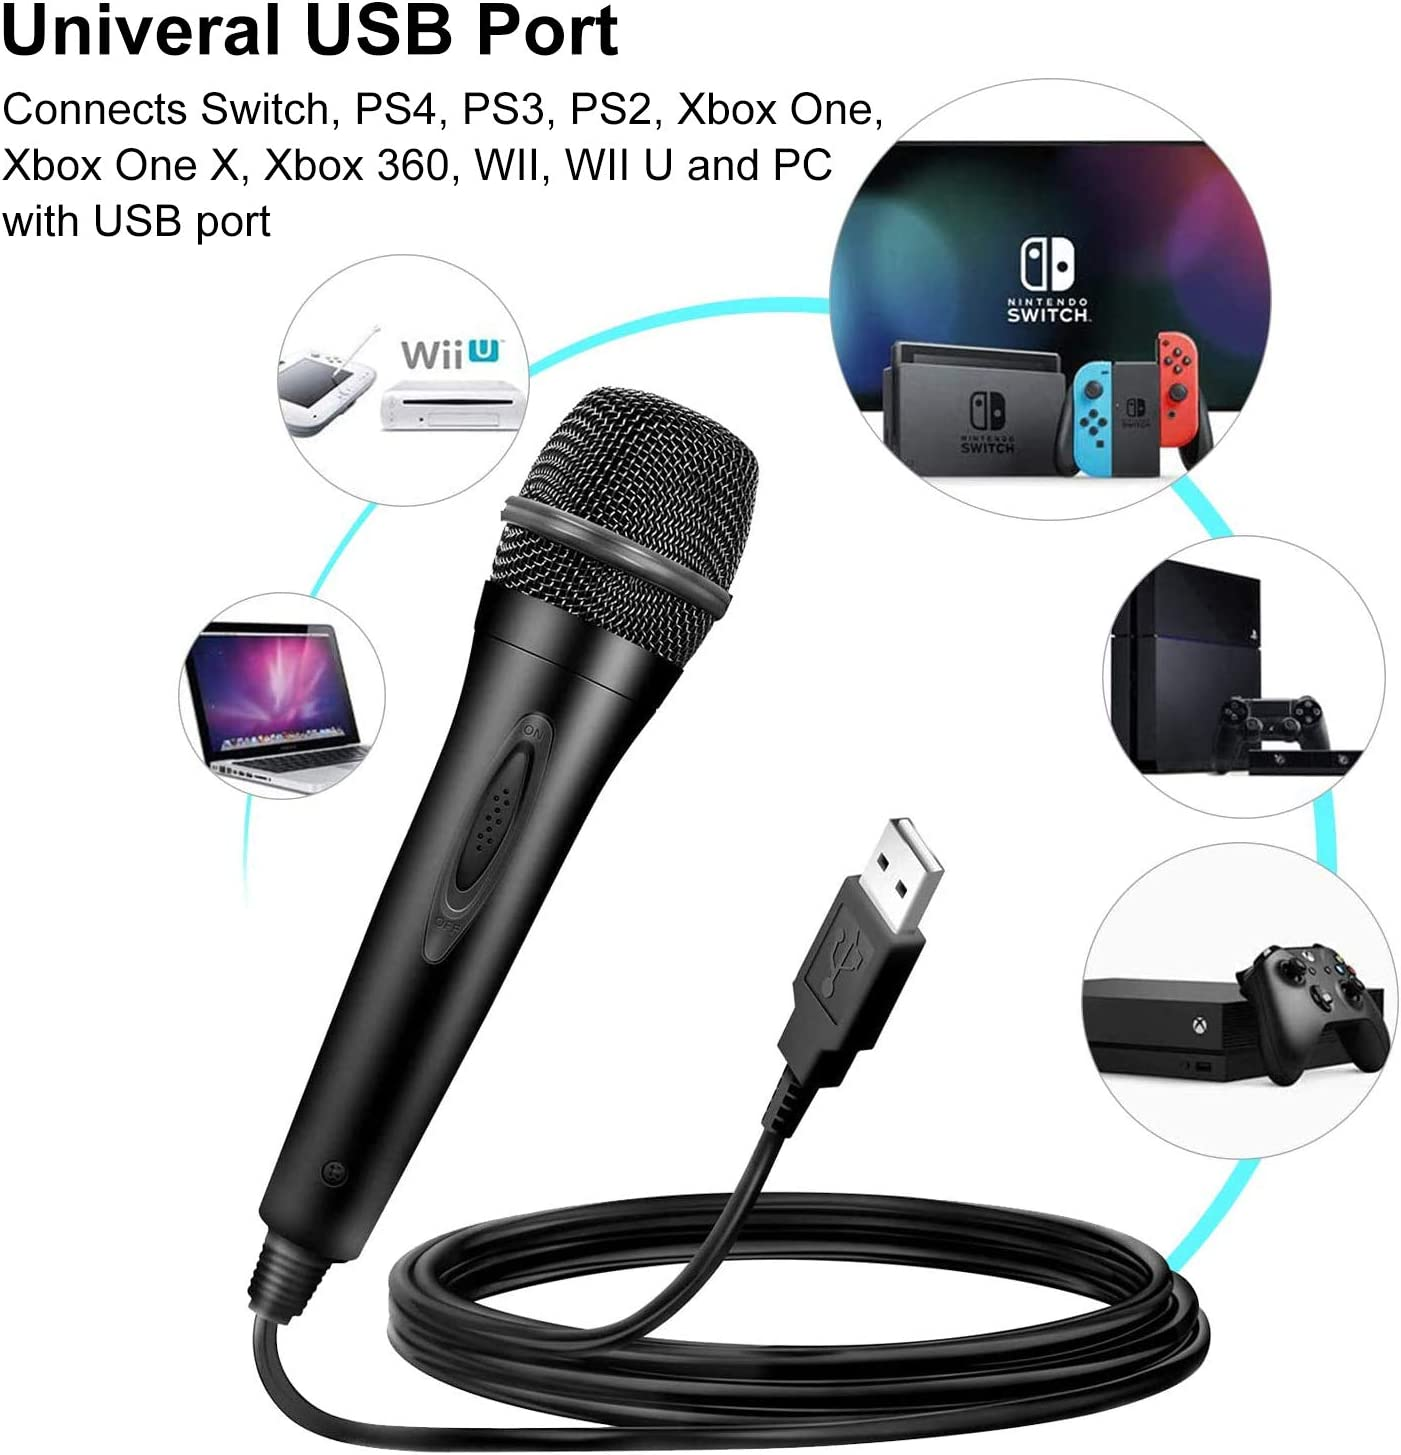 Micrófono con cable para PS4/PS3/Nintendo Switch/Xbox One/Xbox 360/Wii/PC, Micrófono USB Universal soporta LA Voz, Lets Sing, Sing Party, Rock Band, Guitar Hero, Sing Star: Amazon.es: Videojuegos